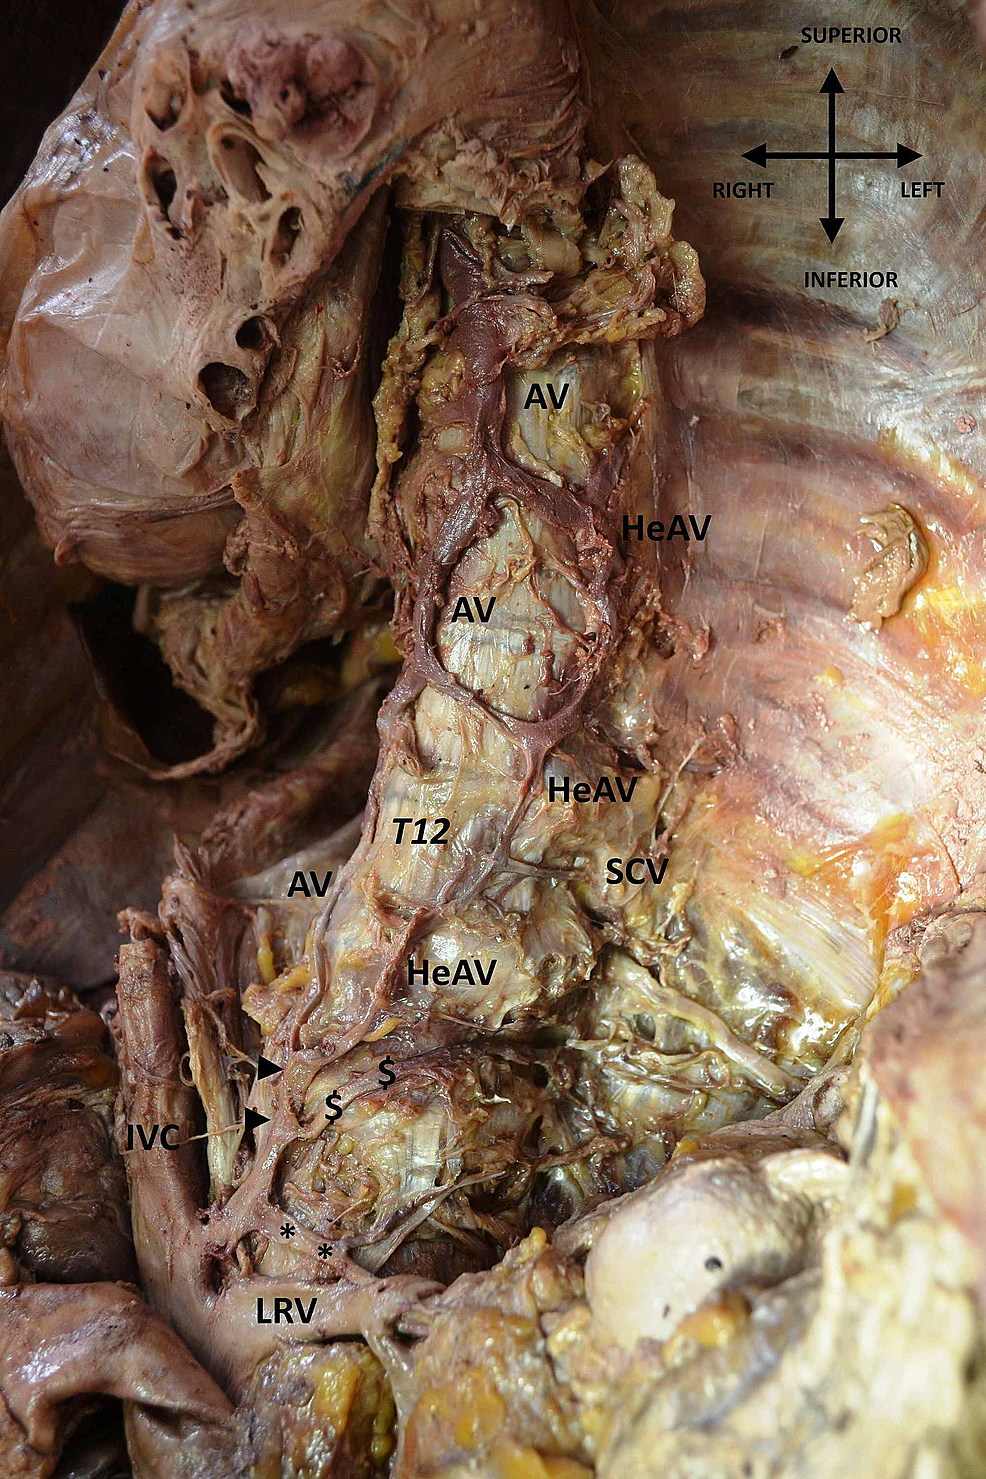 Abnormal-origin-of-azygos-vein-(AV)-system